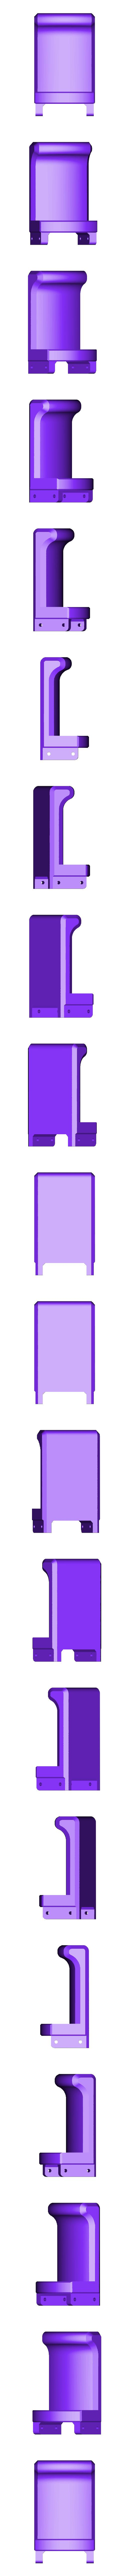 5_Headpone_post_-_mount.stl Download free STL file Headphone holder • 3D printable object, Osichan